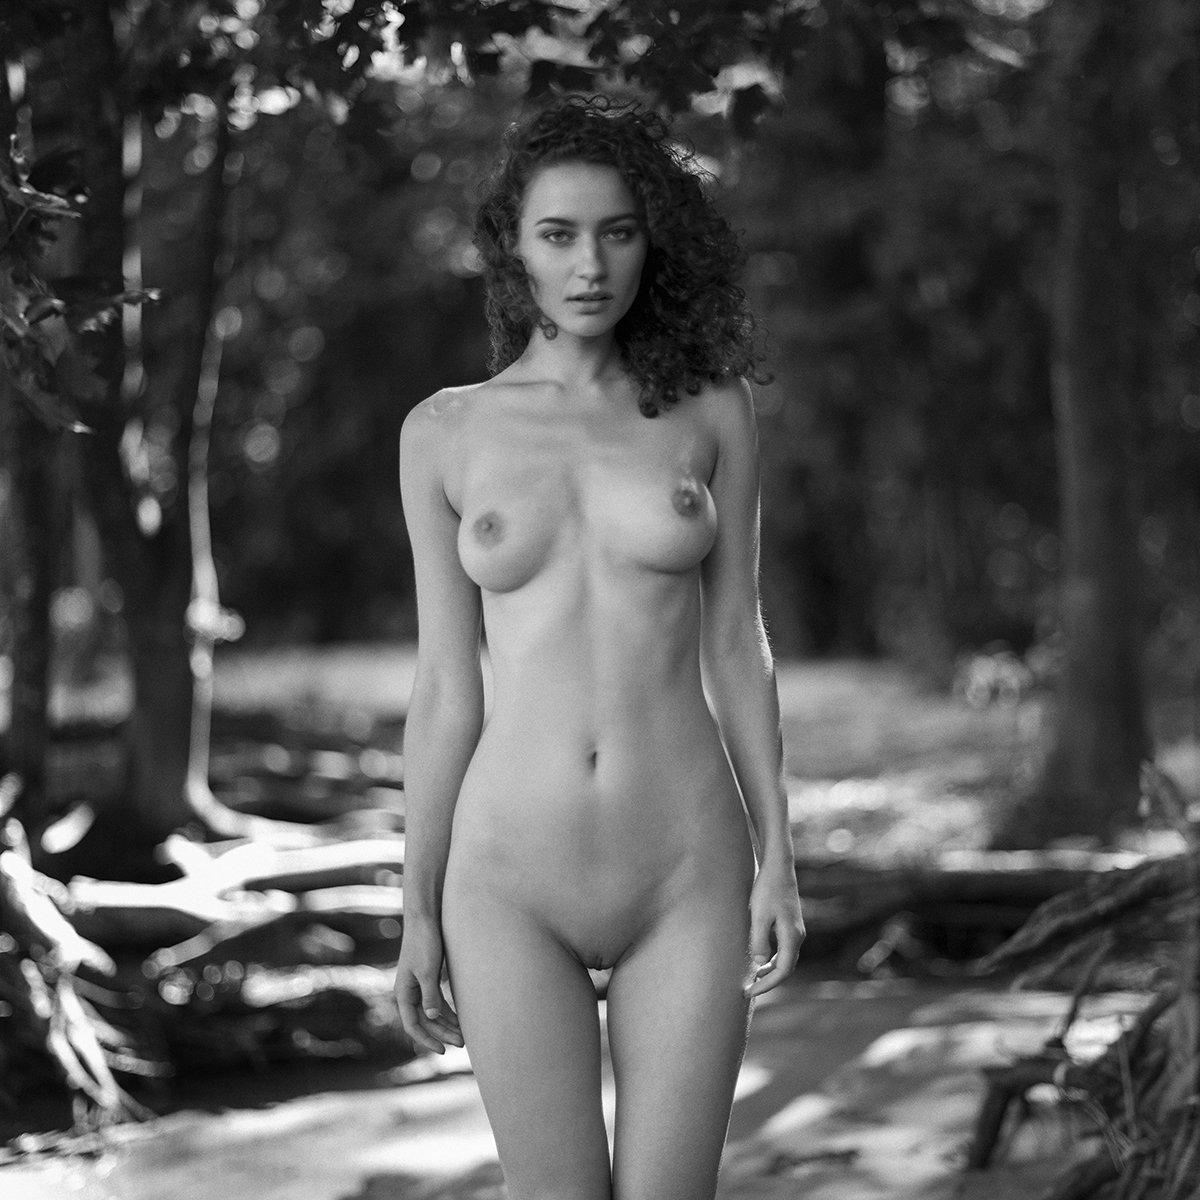 akt, nude, analog, women, topless, fineart, hasselblad, 6x6, bw,, NinoVeron